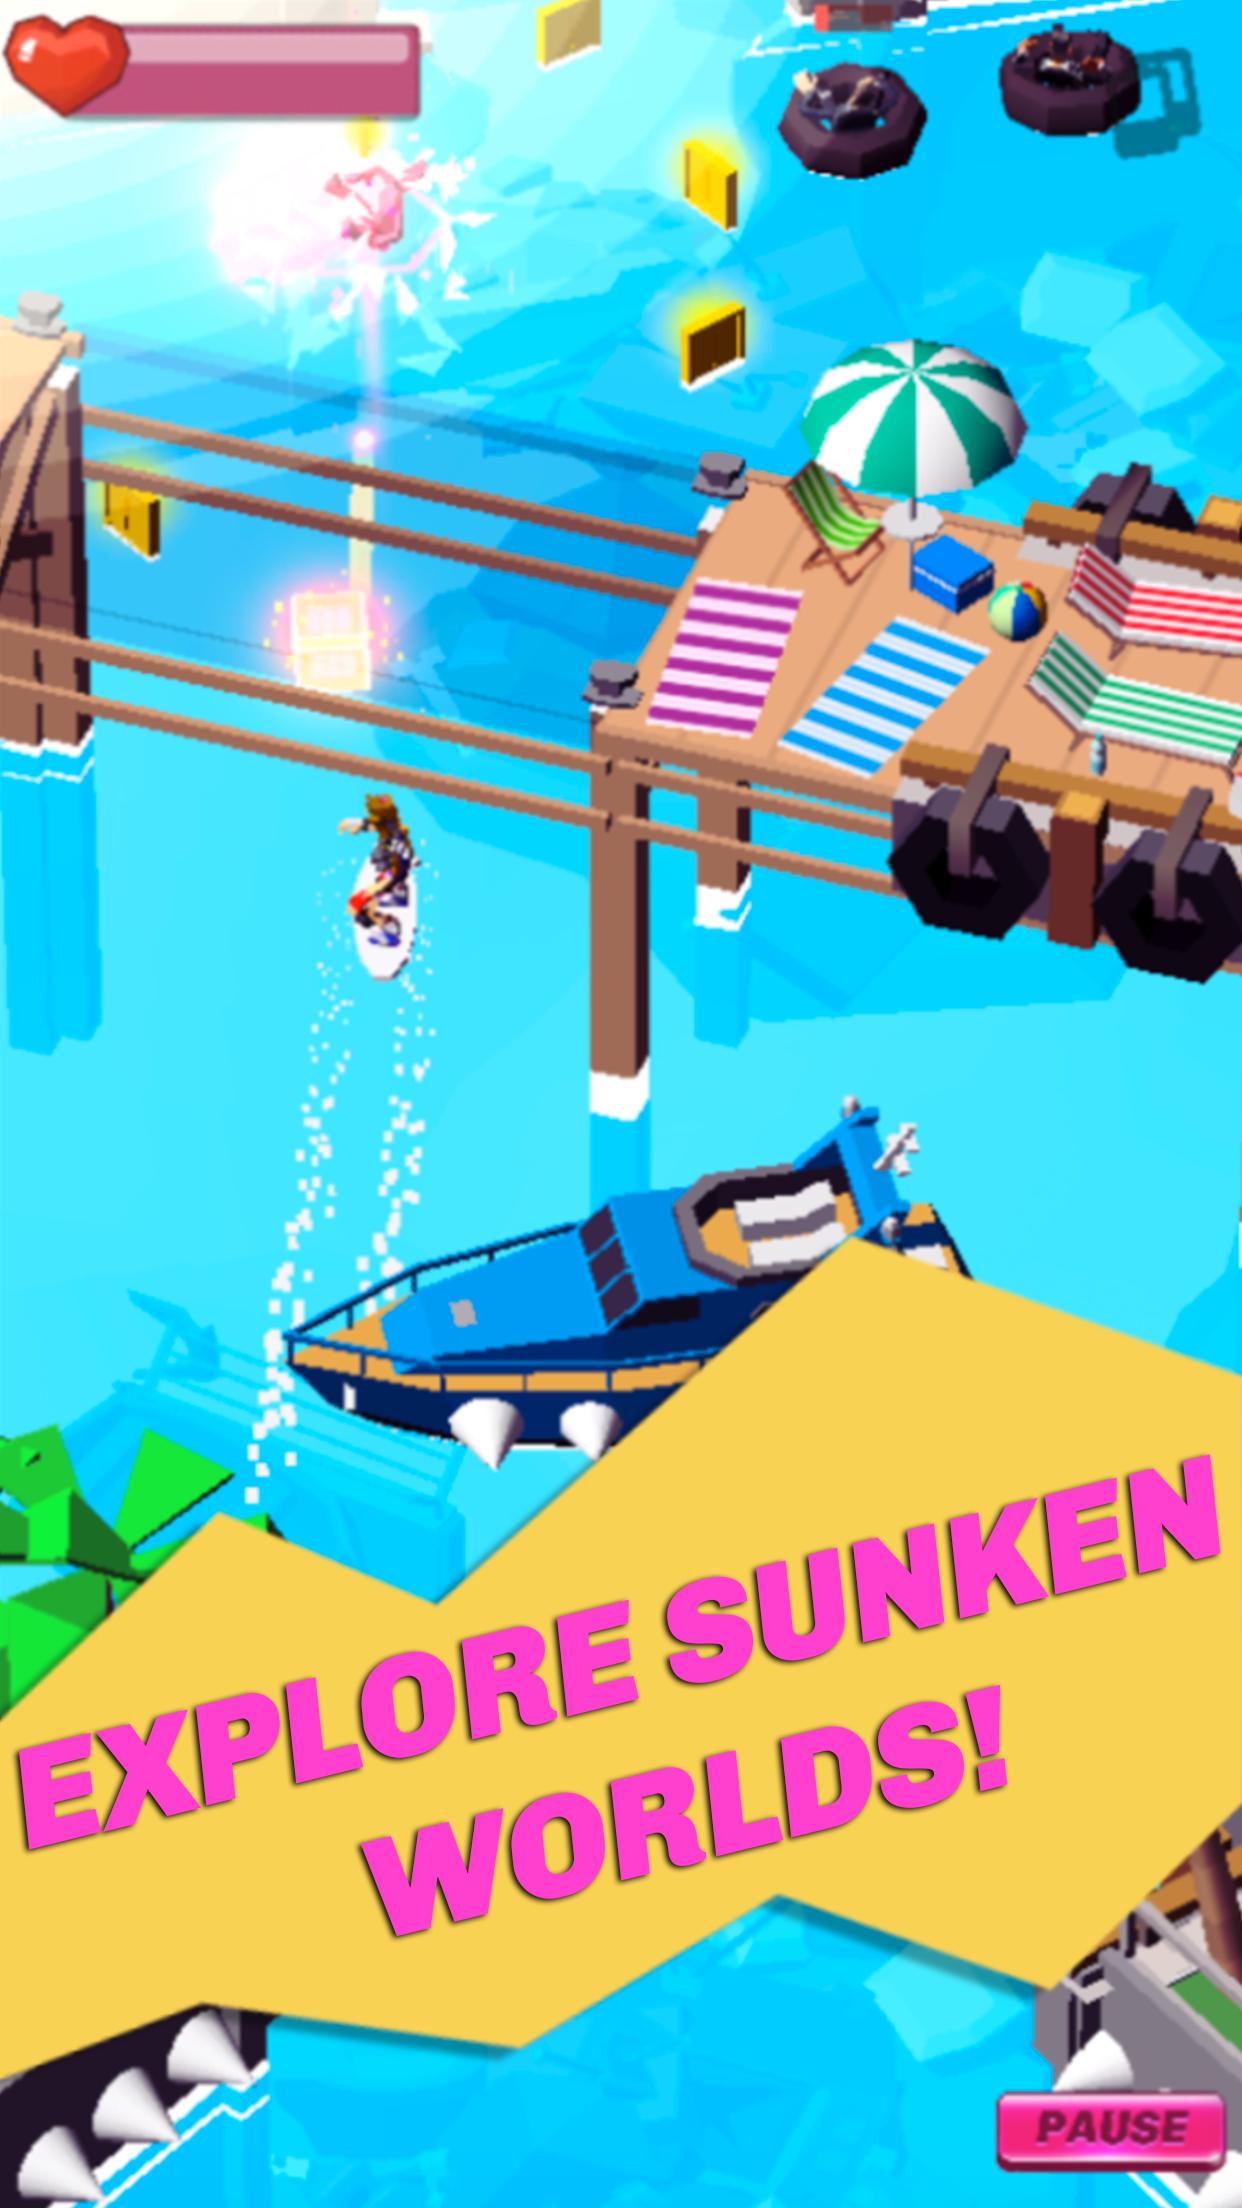 2_screenshot_sunkenWorlds.png